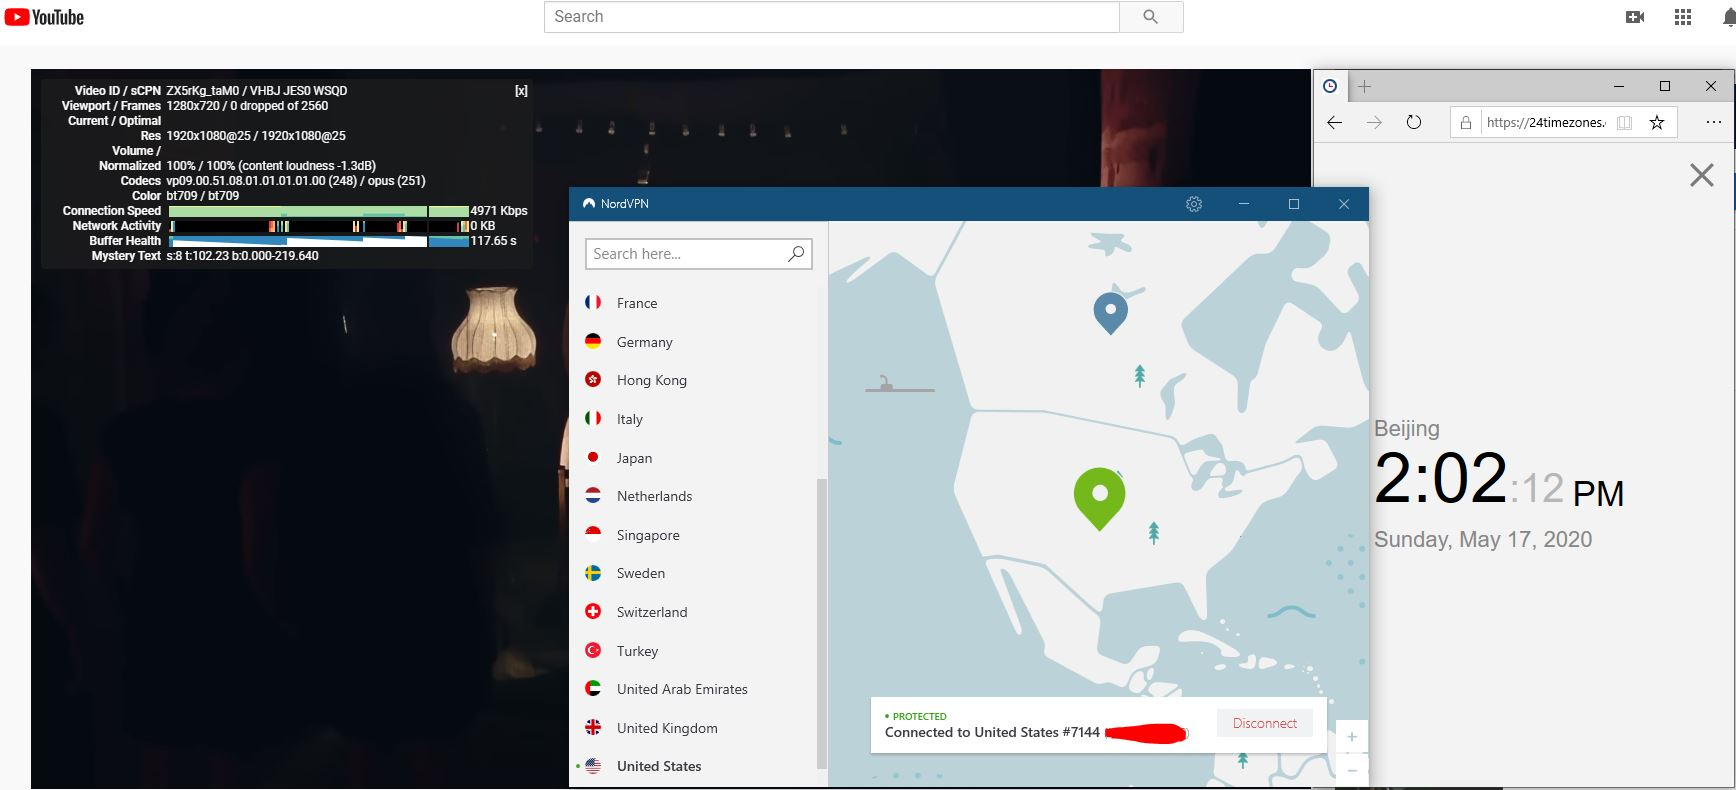 Windows10 NordVPN 混淆开启 USA #7144 中国VPN 翻墙 科学上网 youtube测速-20200517